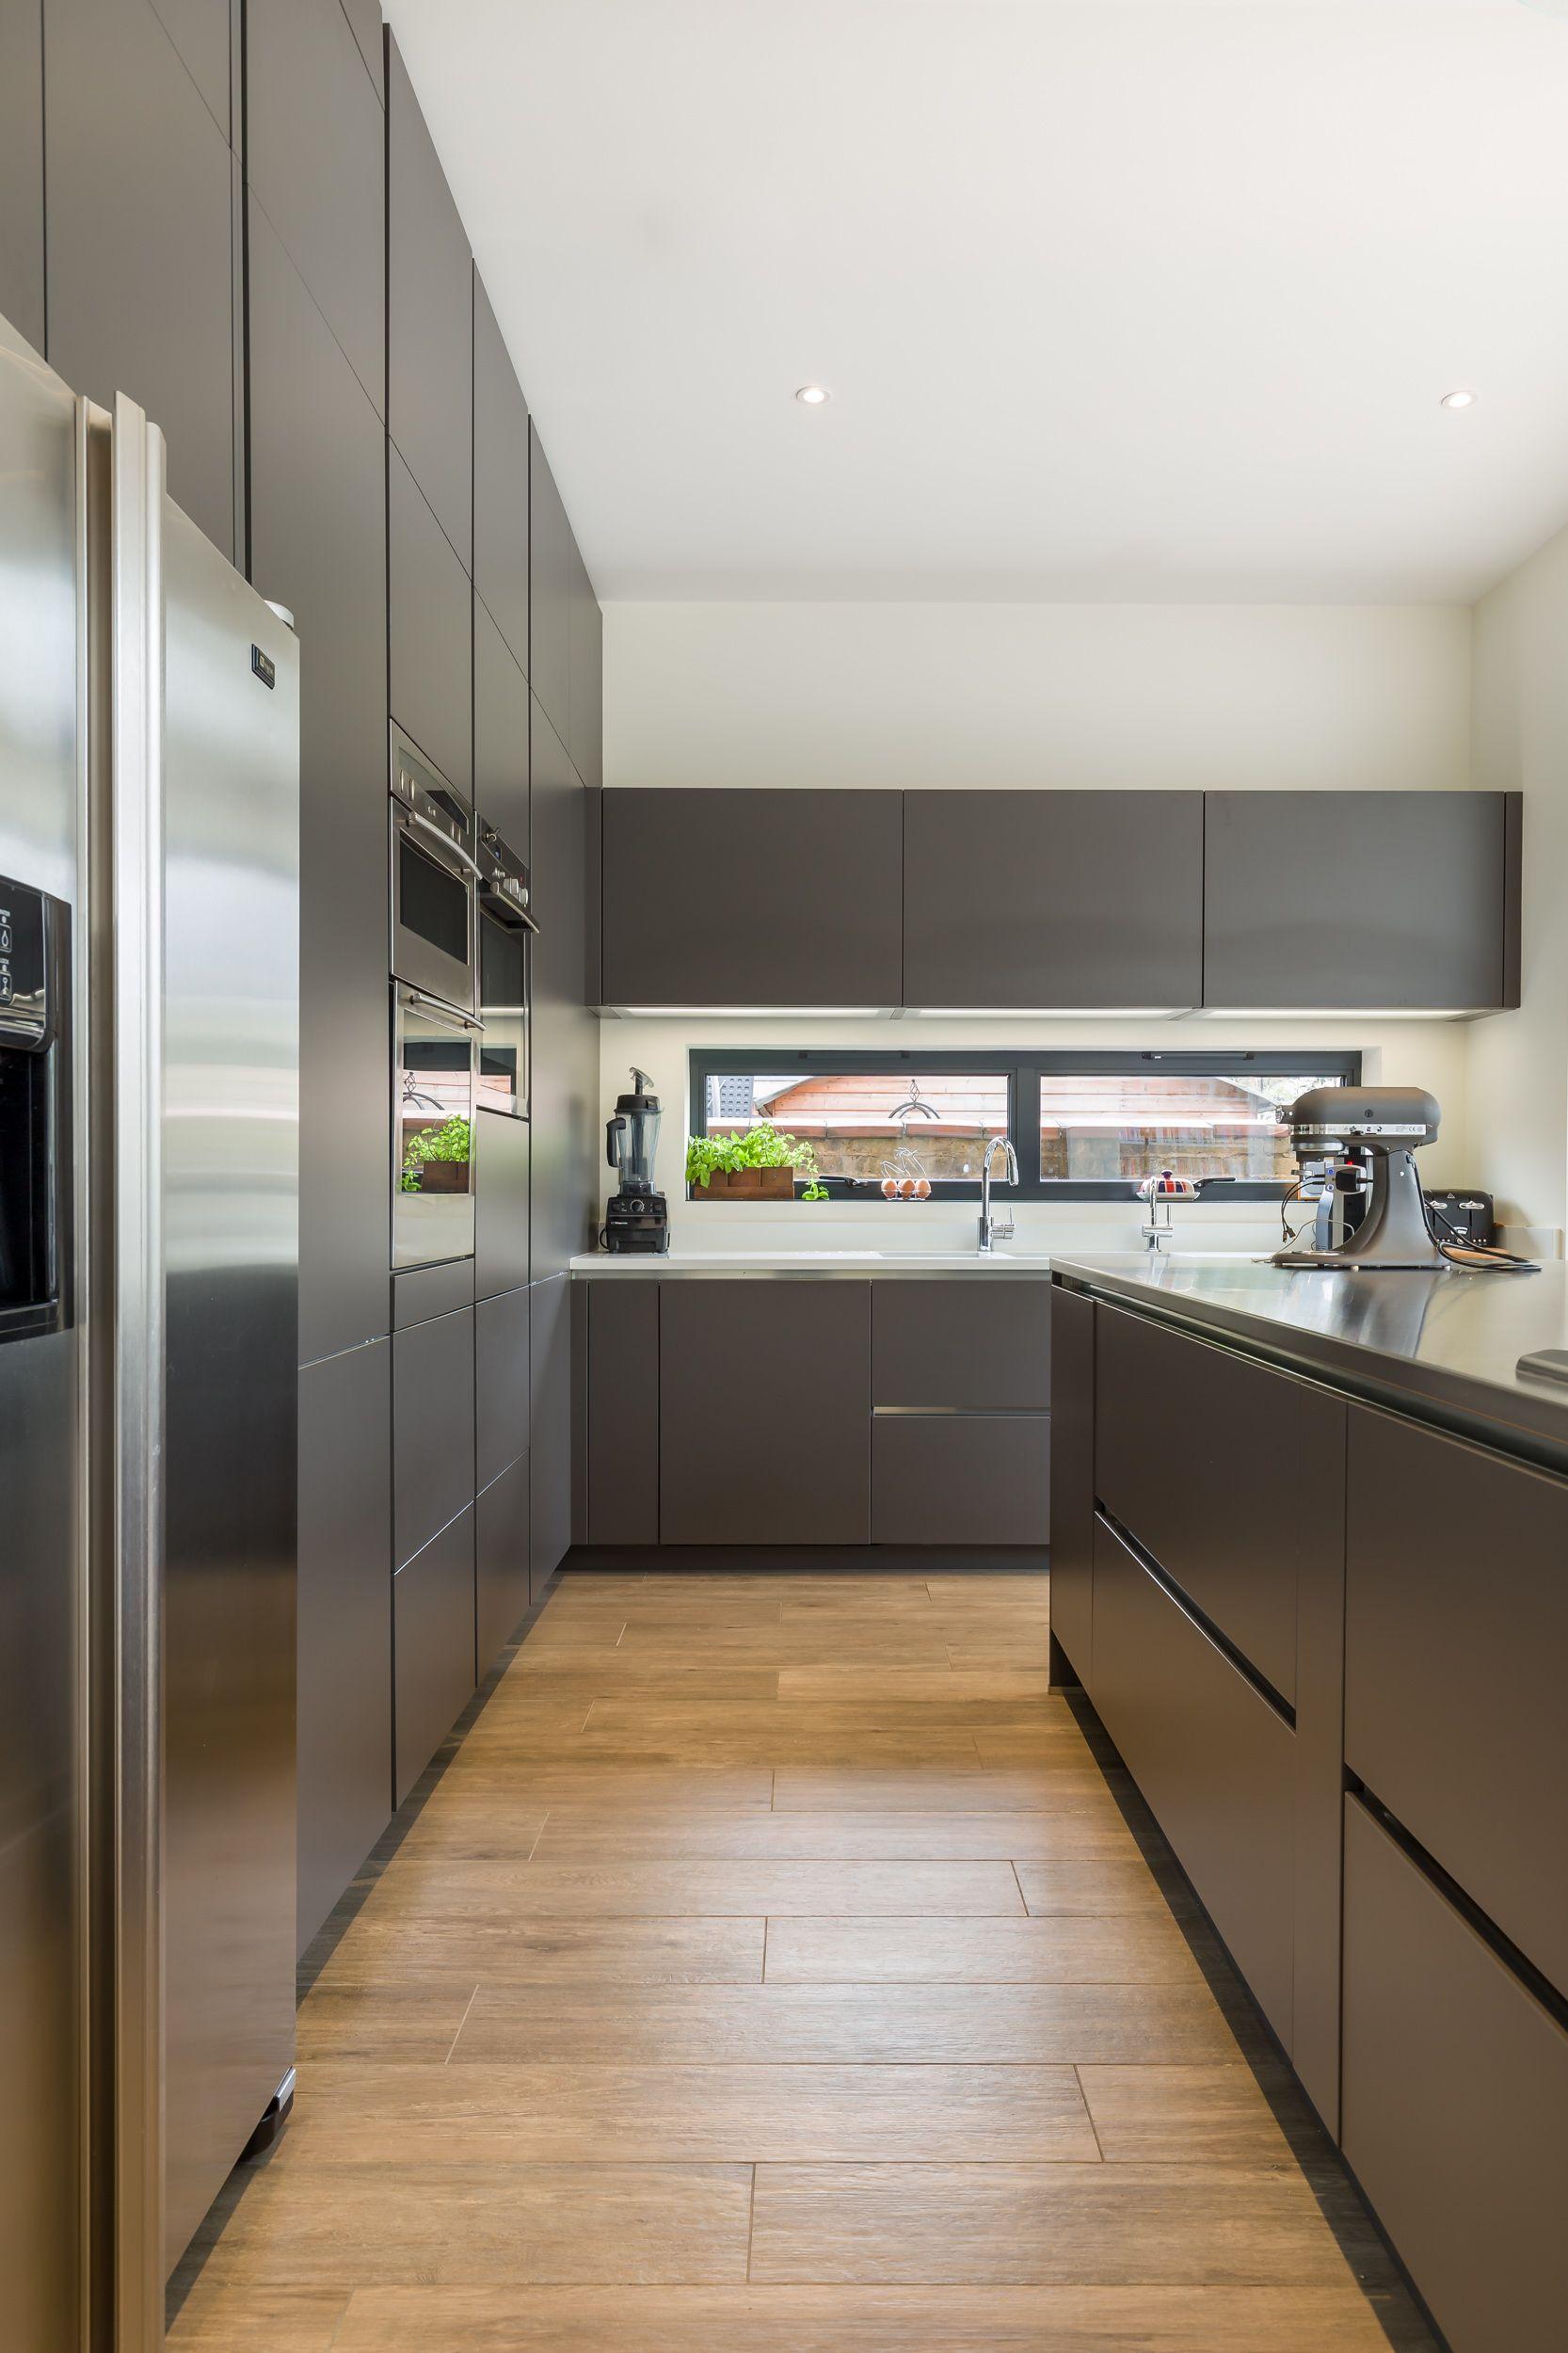 Home Renovation Kitchen Extension Family Room Modern Design